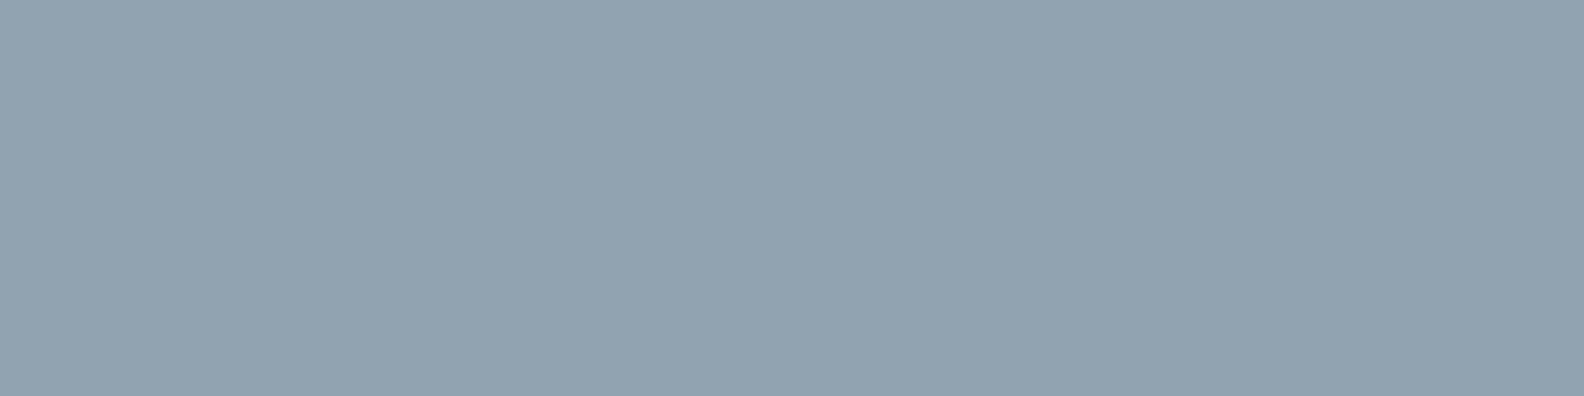 1584x396 Cadet Grey Solid Color Background